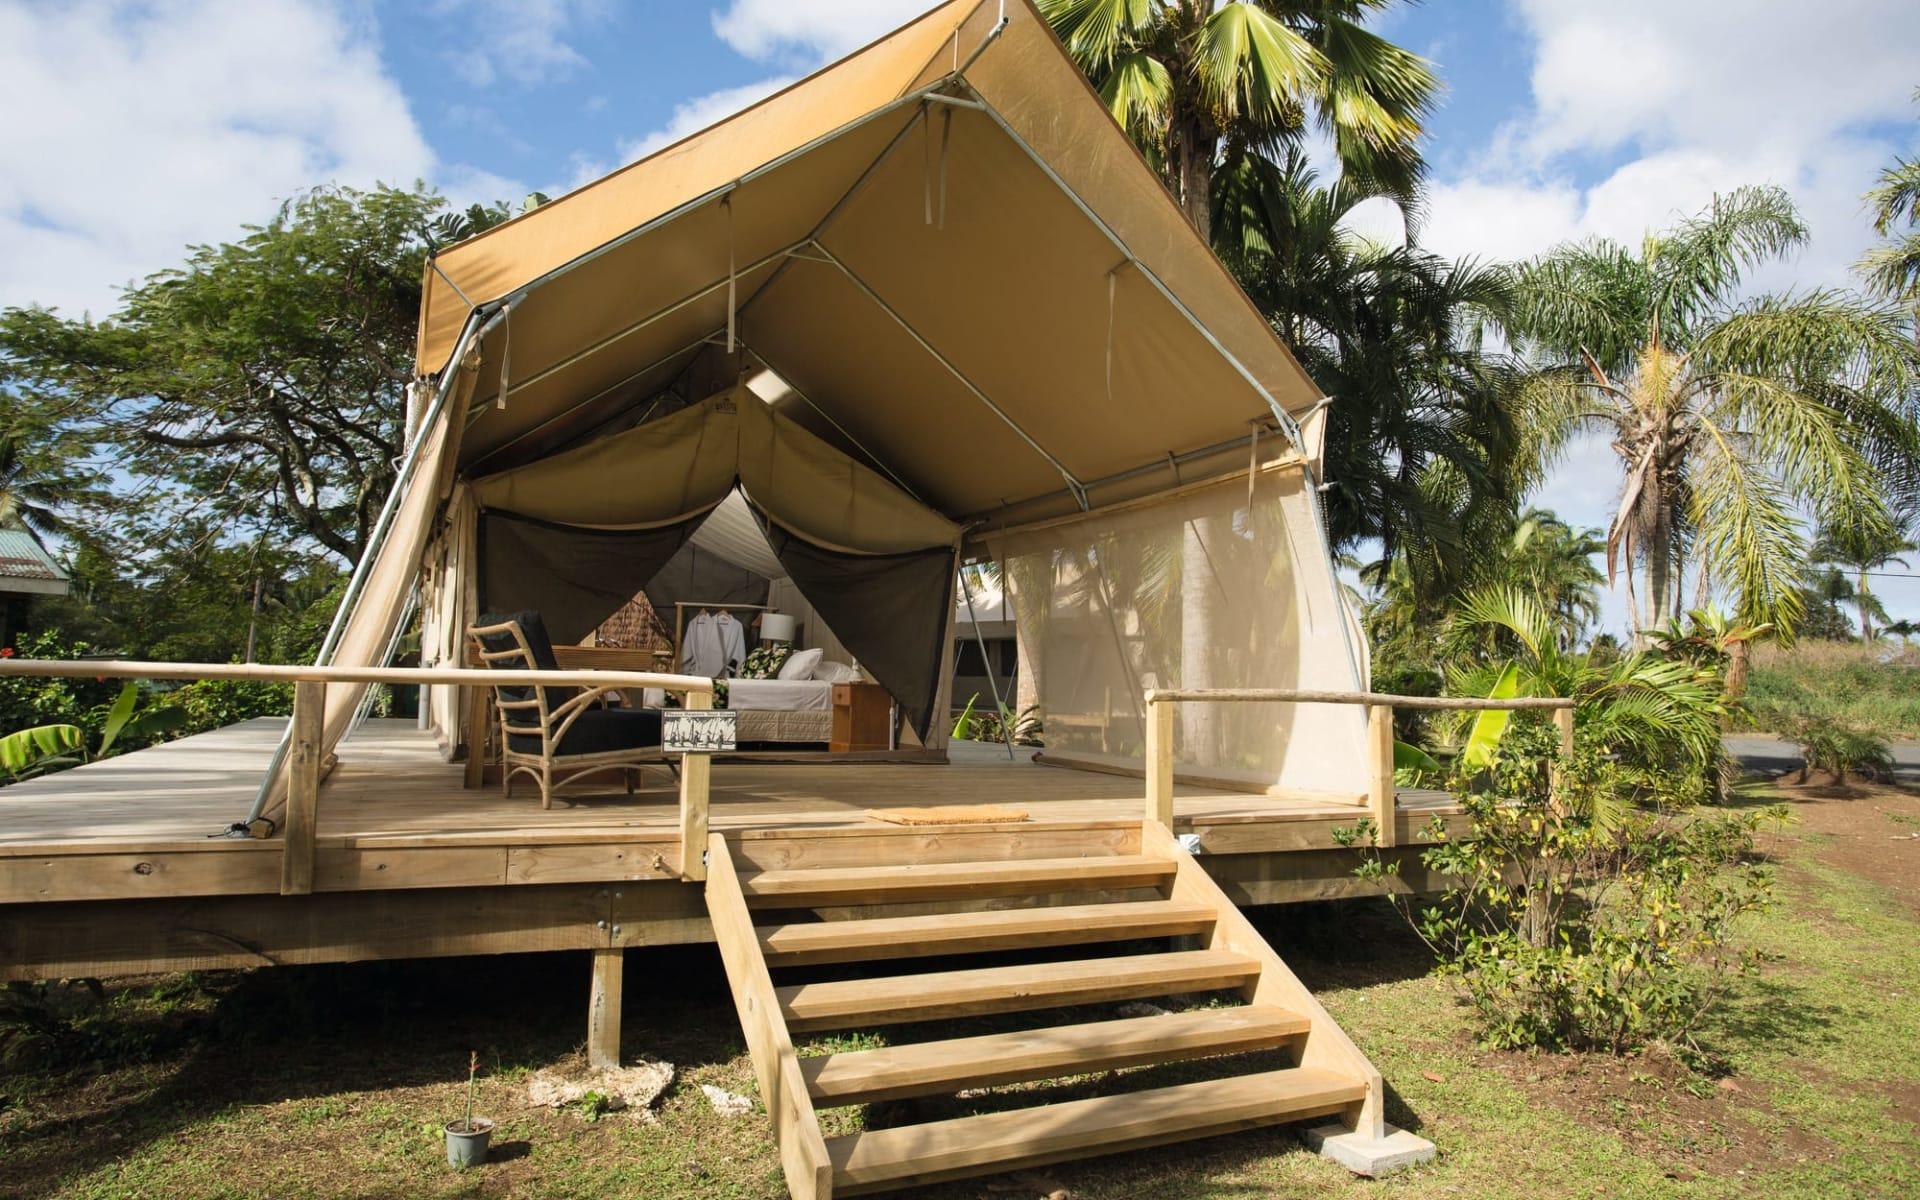 Ikurangi Eco Retreat in Rarotonga:  Ikurangi Eco Retreat Rarotonga Cook Islands - Blick auf Luxury Safari Tent von aussen